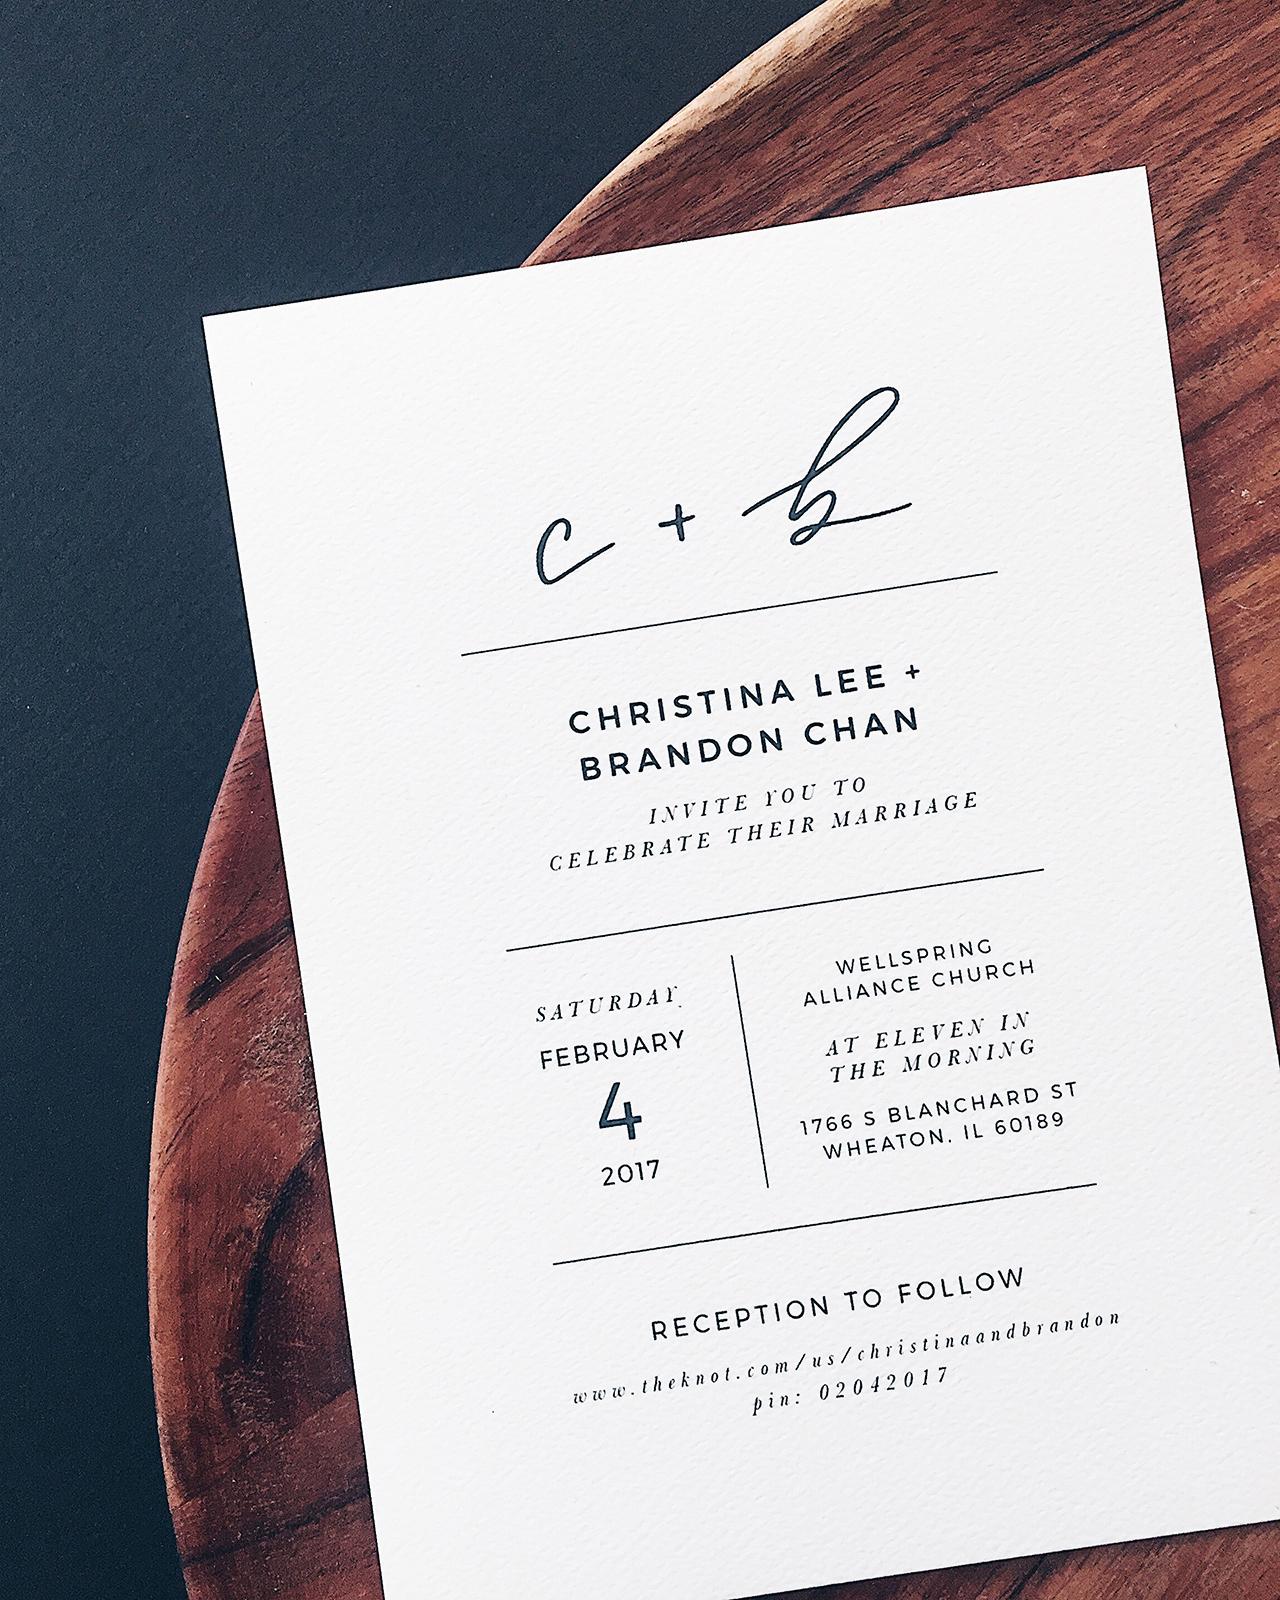 Wedding Invitation Design Ideas New Minimalist Black and White Hand Lettered Wedding Invitations